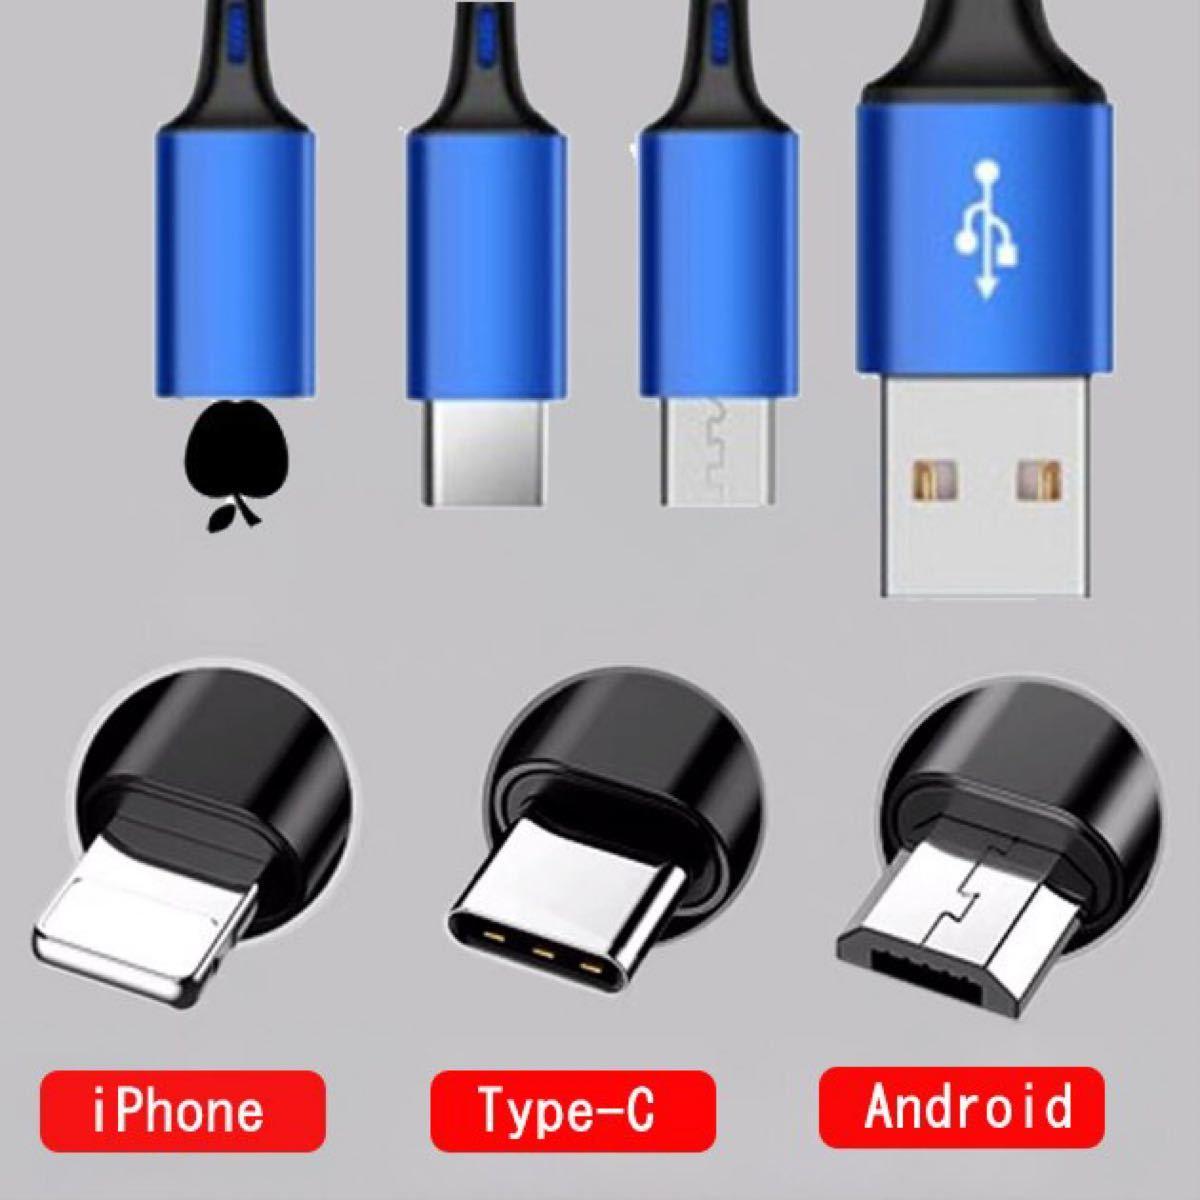 1.2m ケーブル iPhone ケーブル アイフォンケーブル 急速充電 高耐久 3in1 iPhone ライトニングケーブル